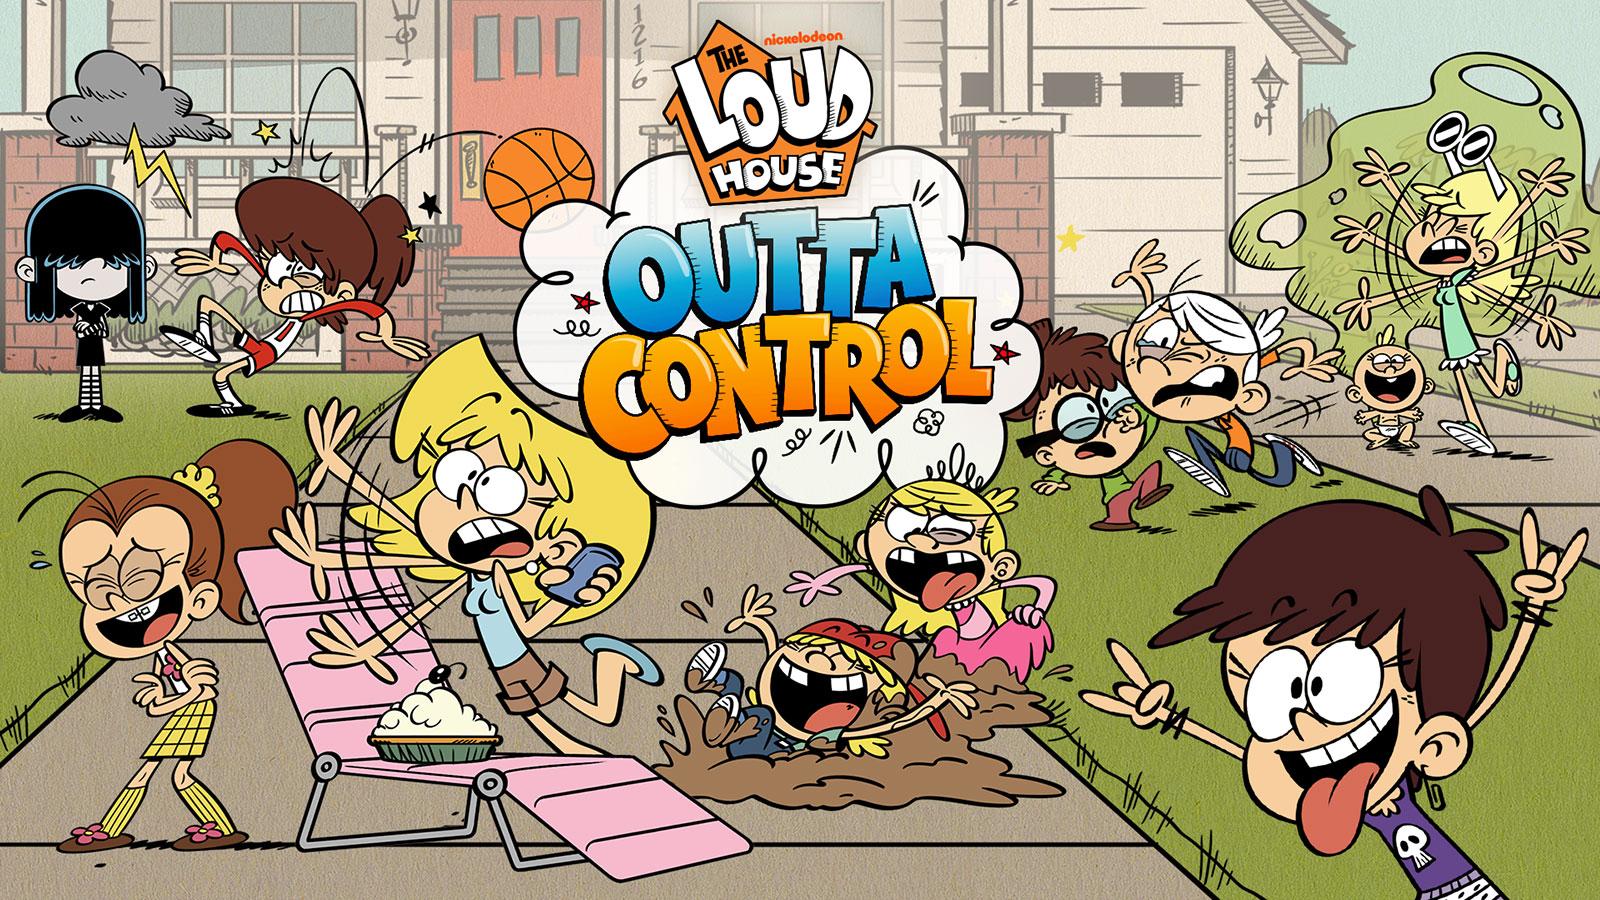 Apple Arcade เปิดตัว Loud House: Outta Control เกมใหม่จาก Nickelodeon